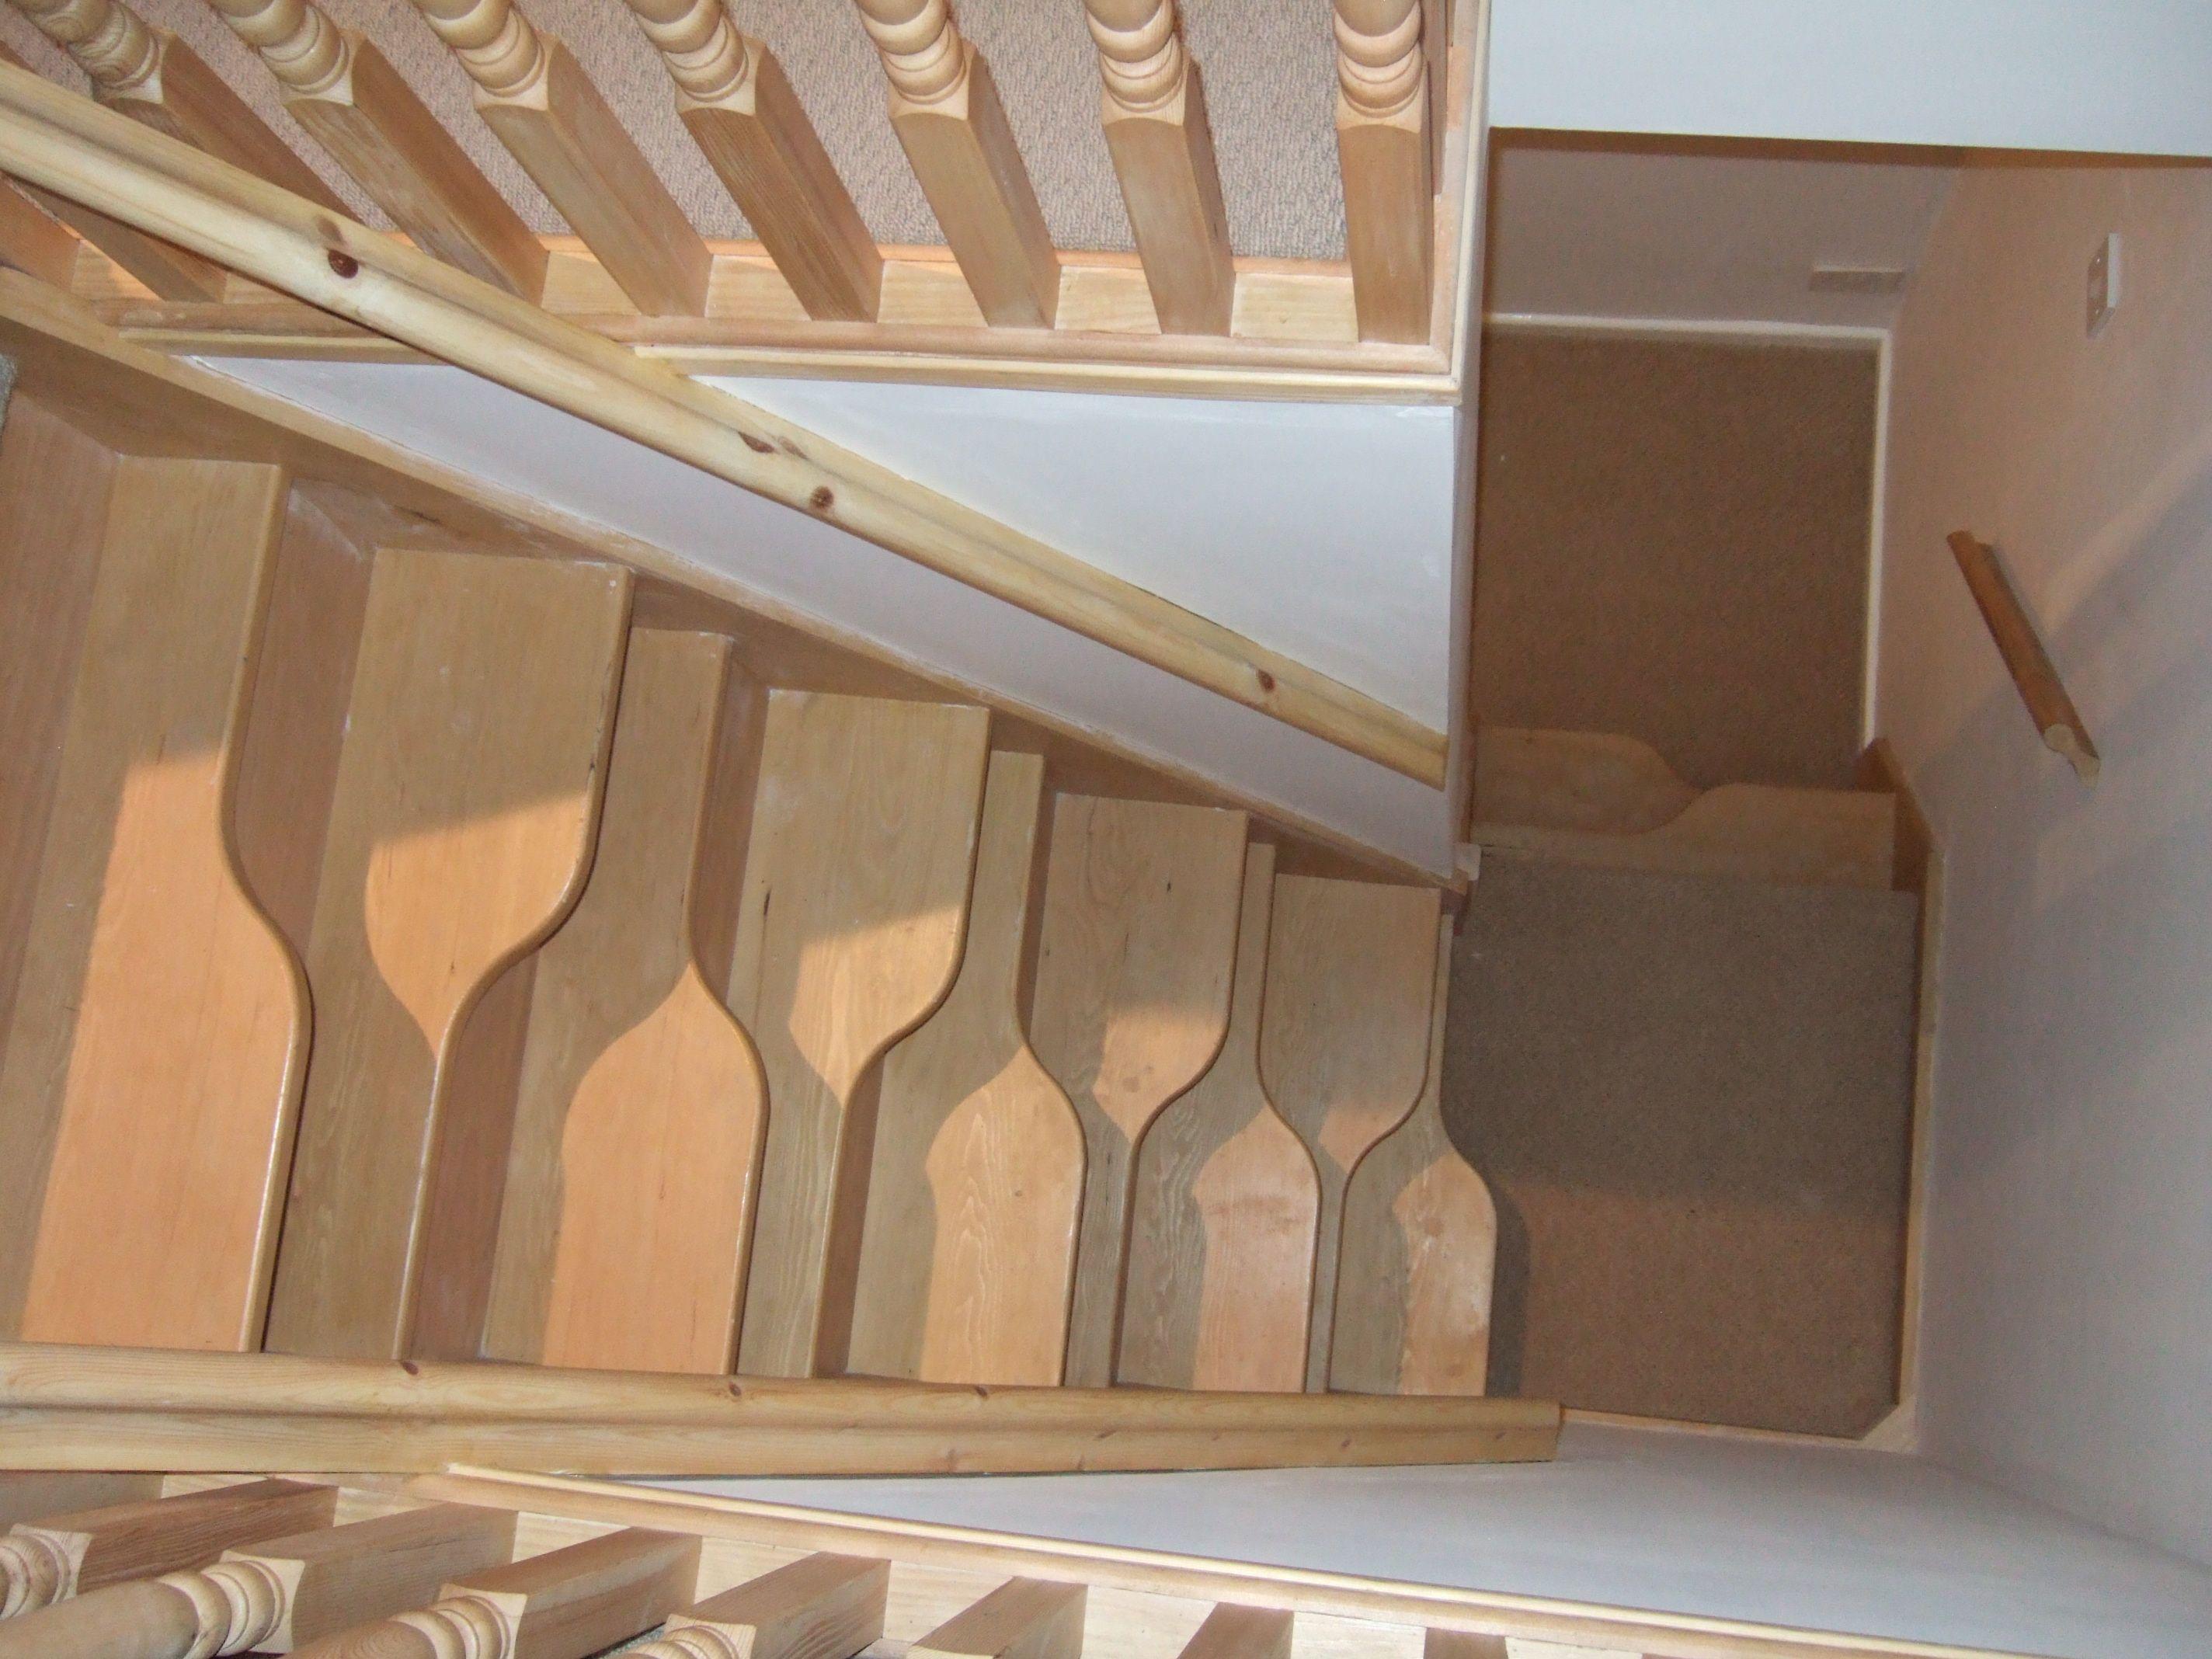 Space Saver Staircase Cool Space Saver Staircase Design Ideas